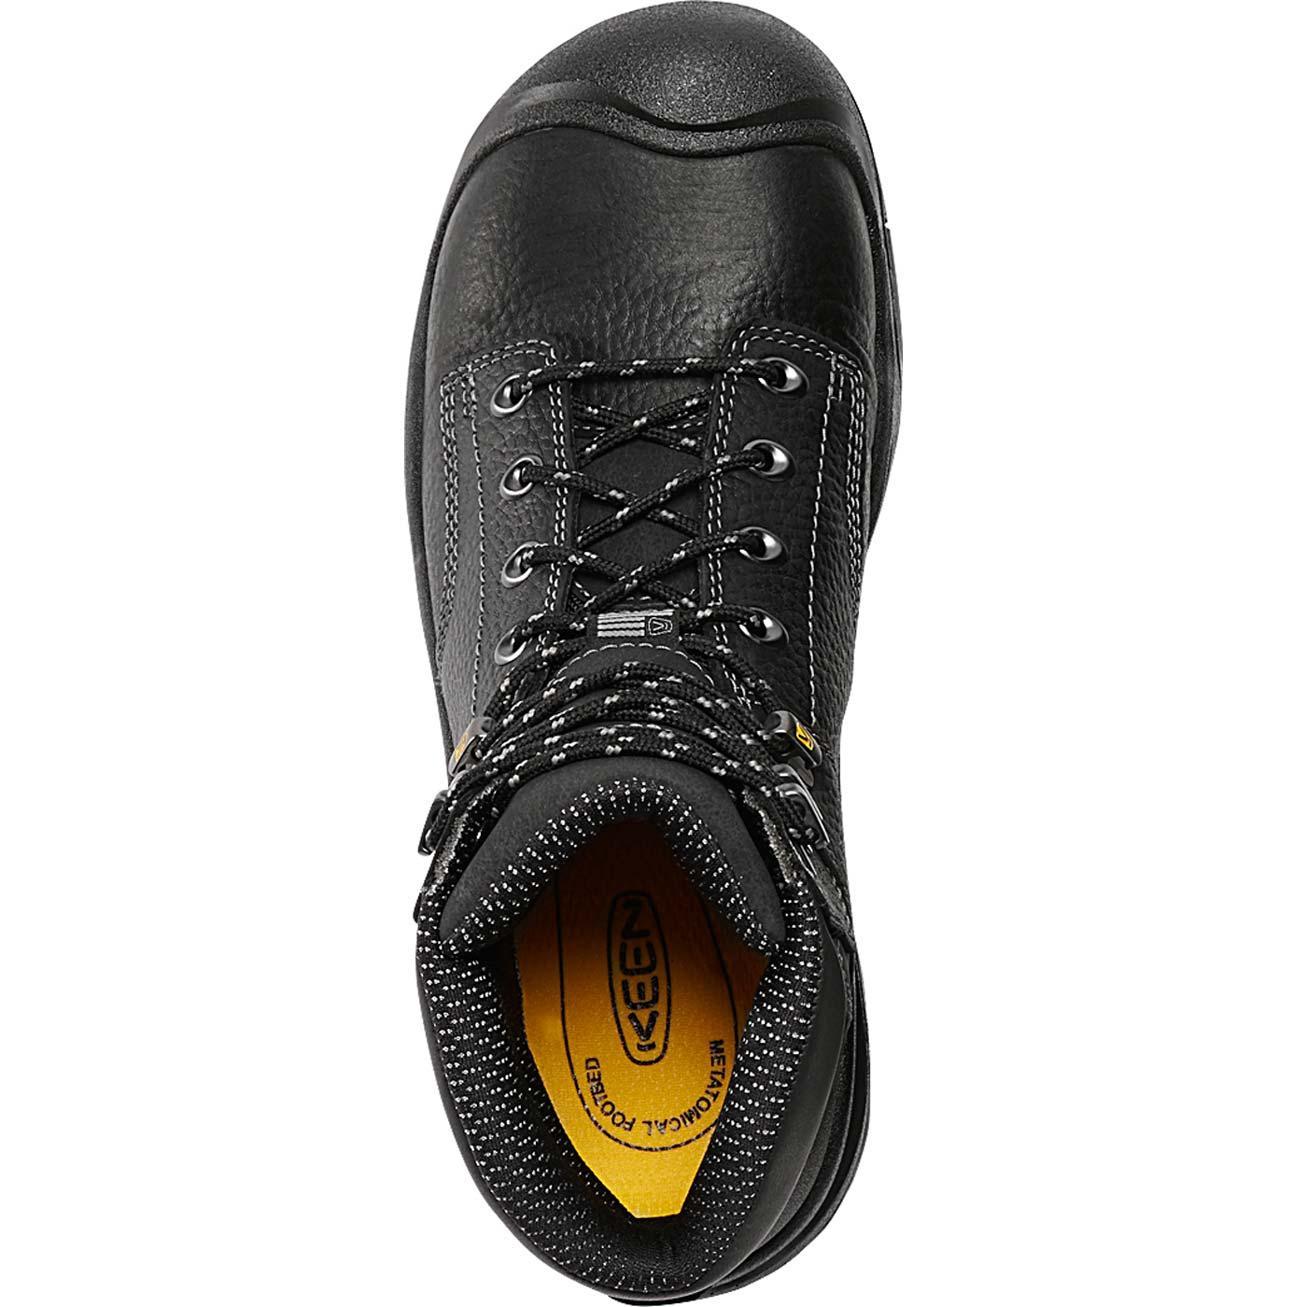 2d334c2275 ... Utility® Mt Vernon Steel Toe Waterproof Work Boot,. Loading zoom